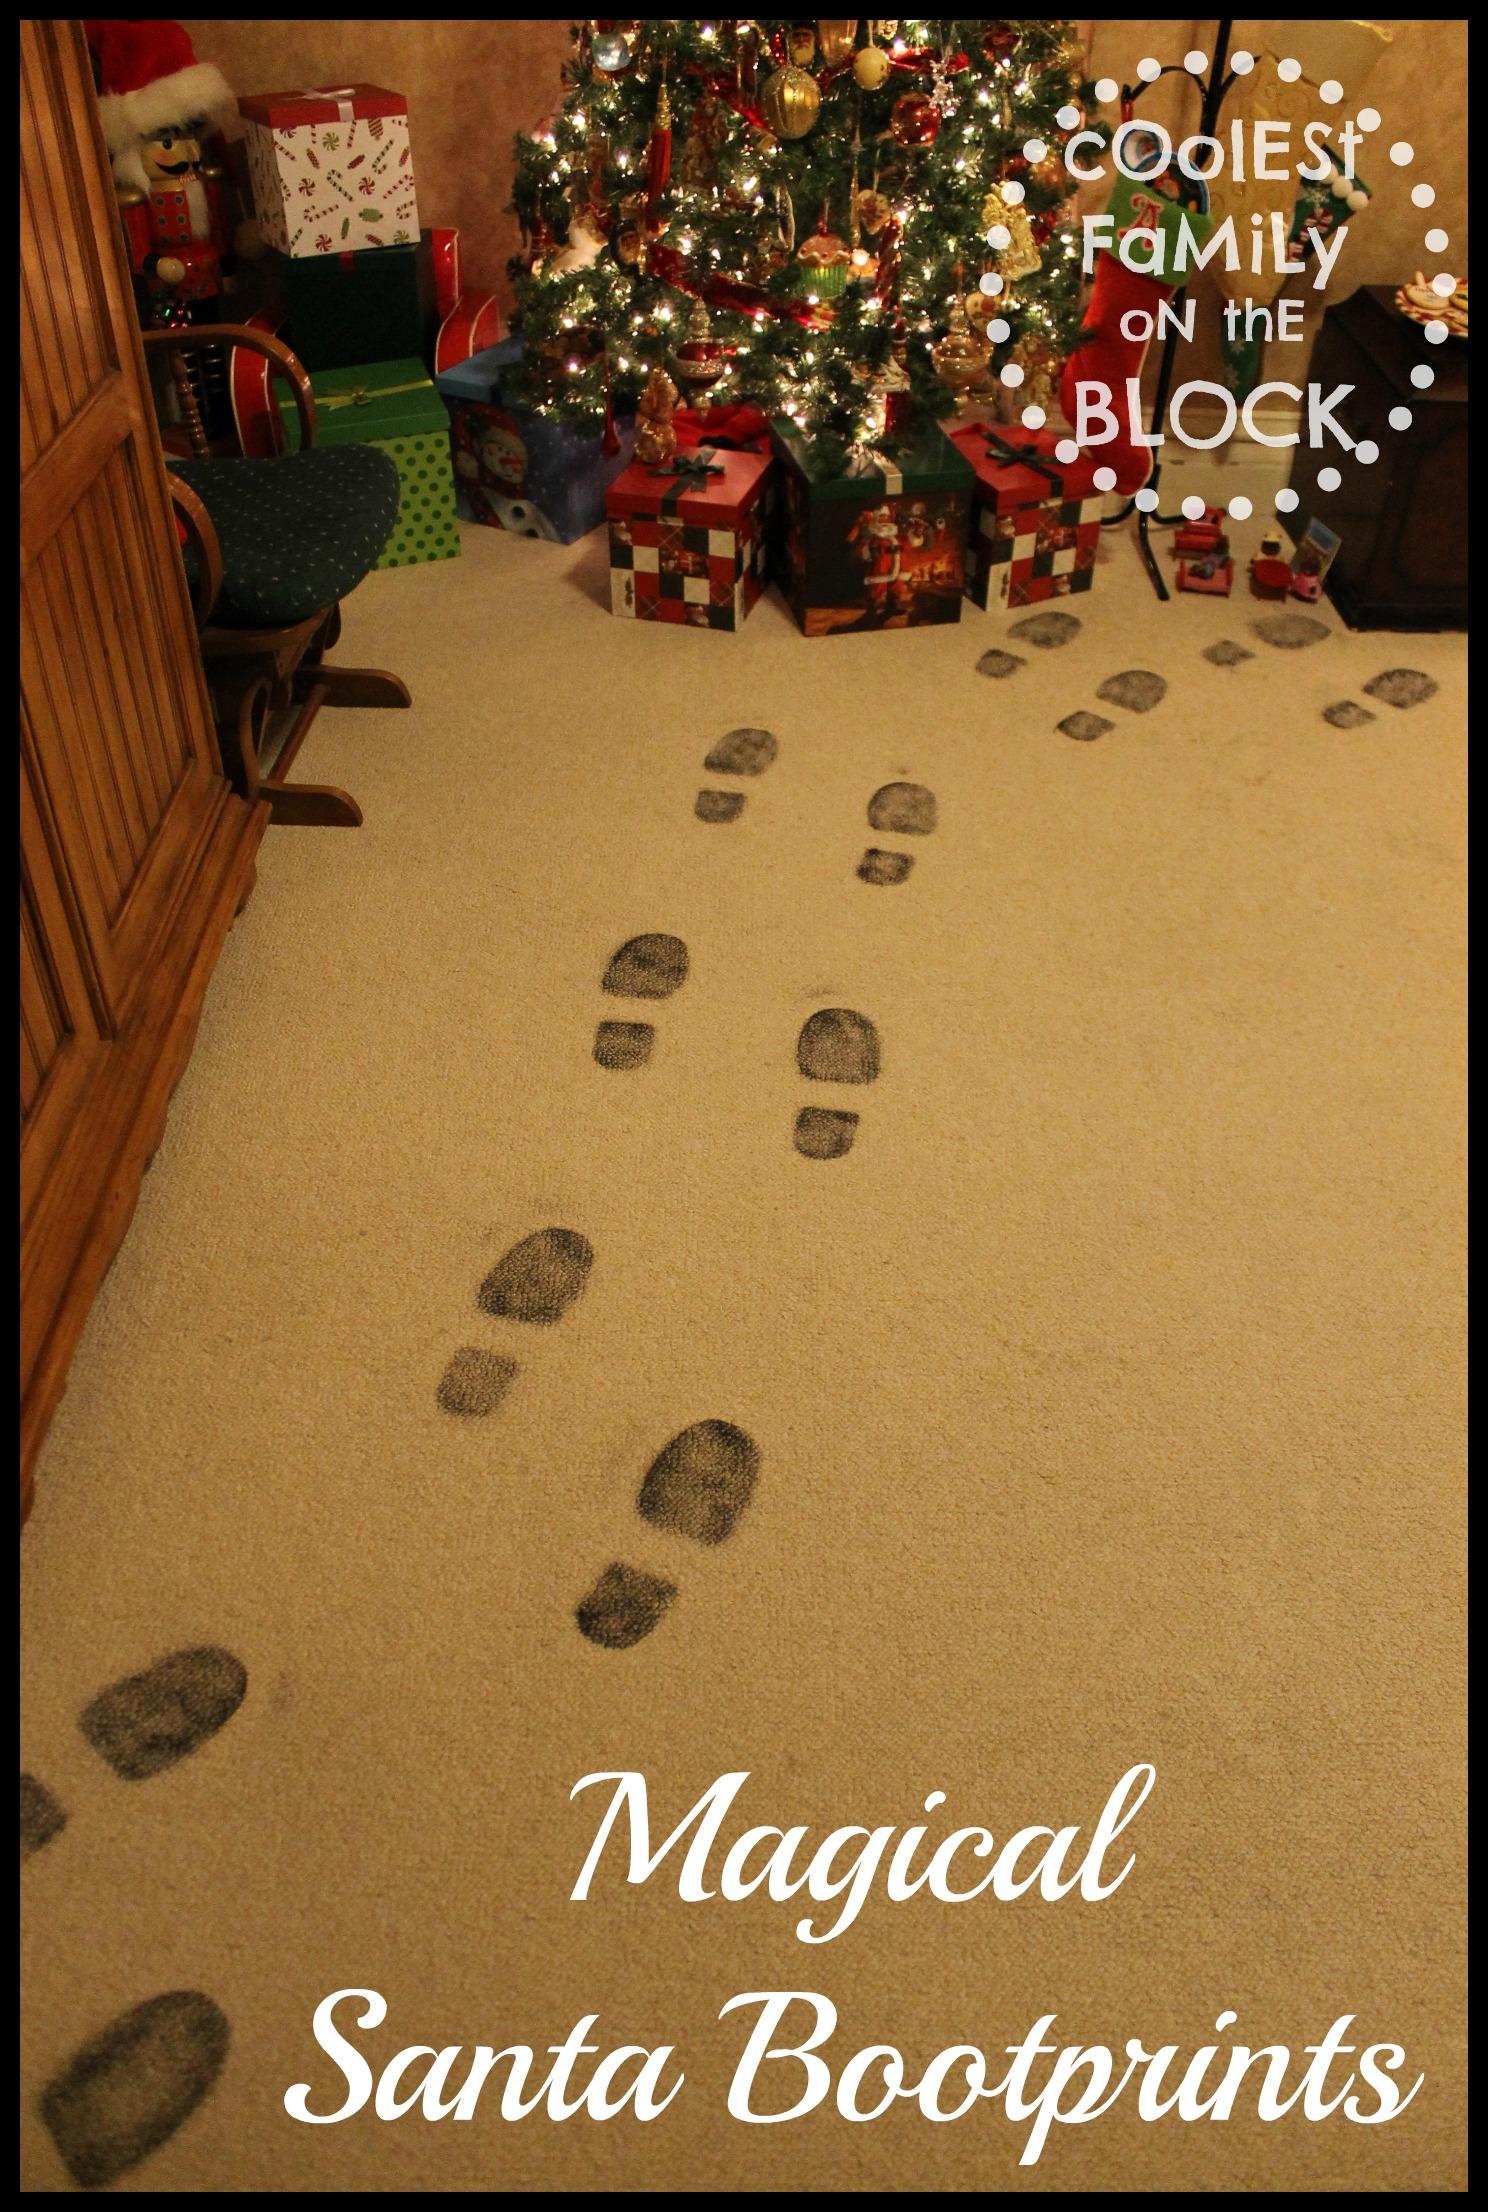 Santa Proof: Magical Santa Bootprints   Coolest Family on ...